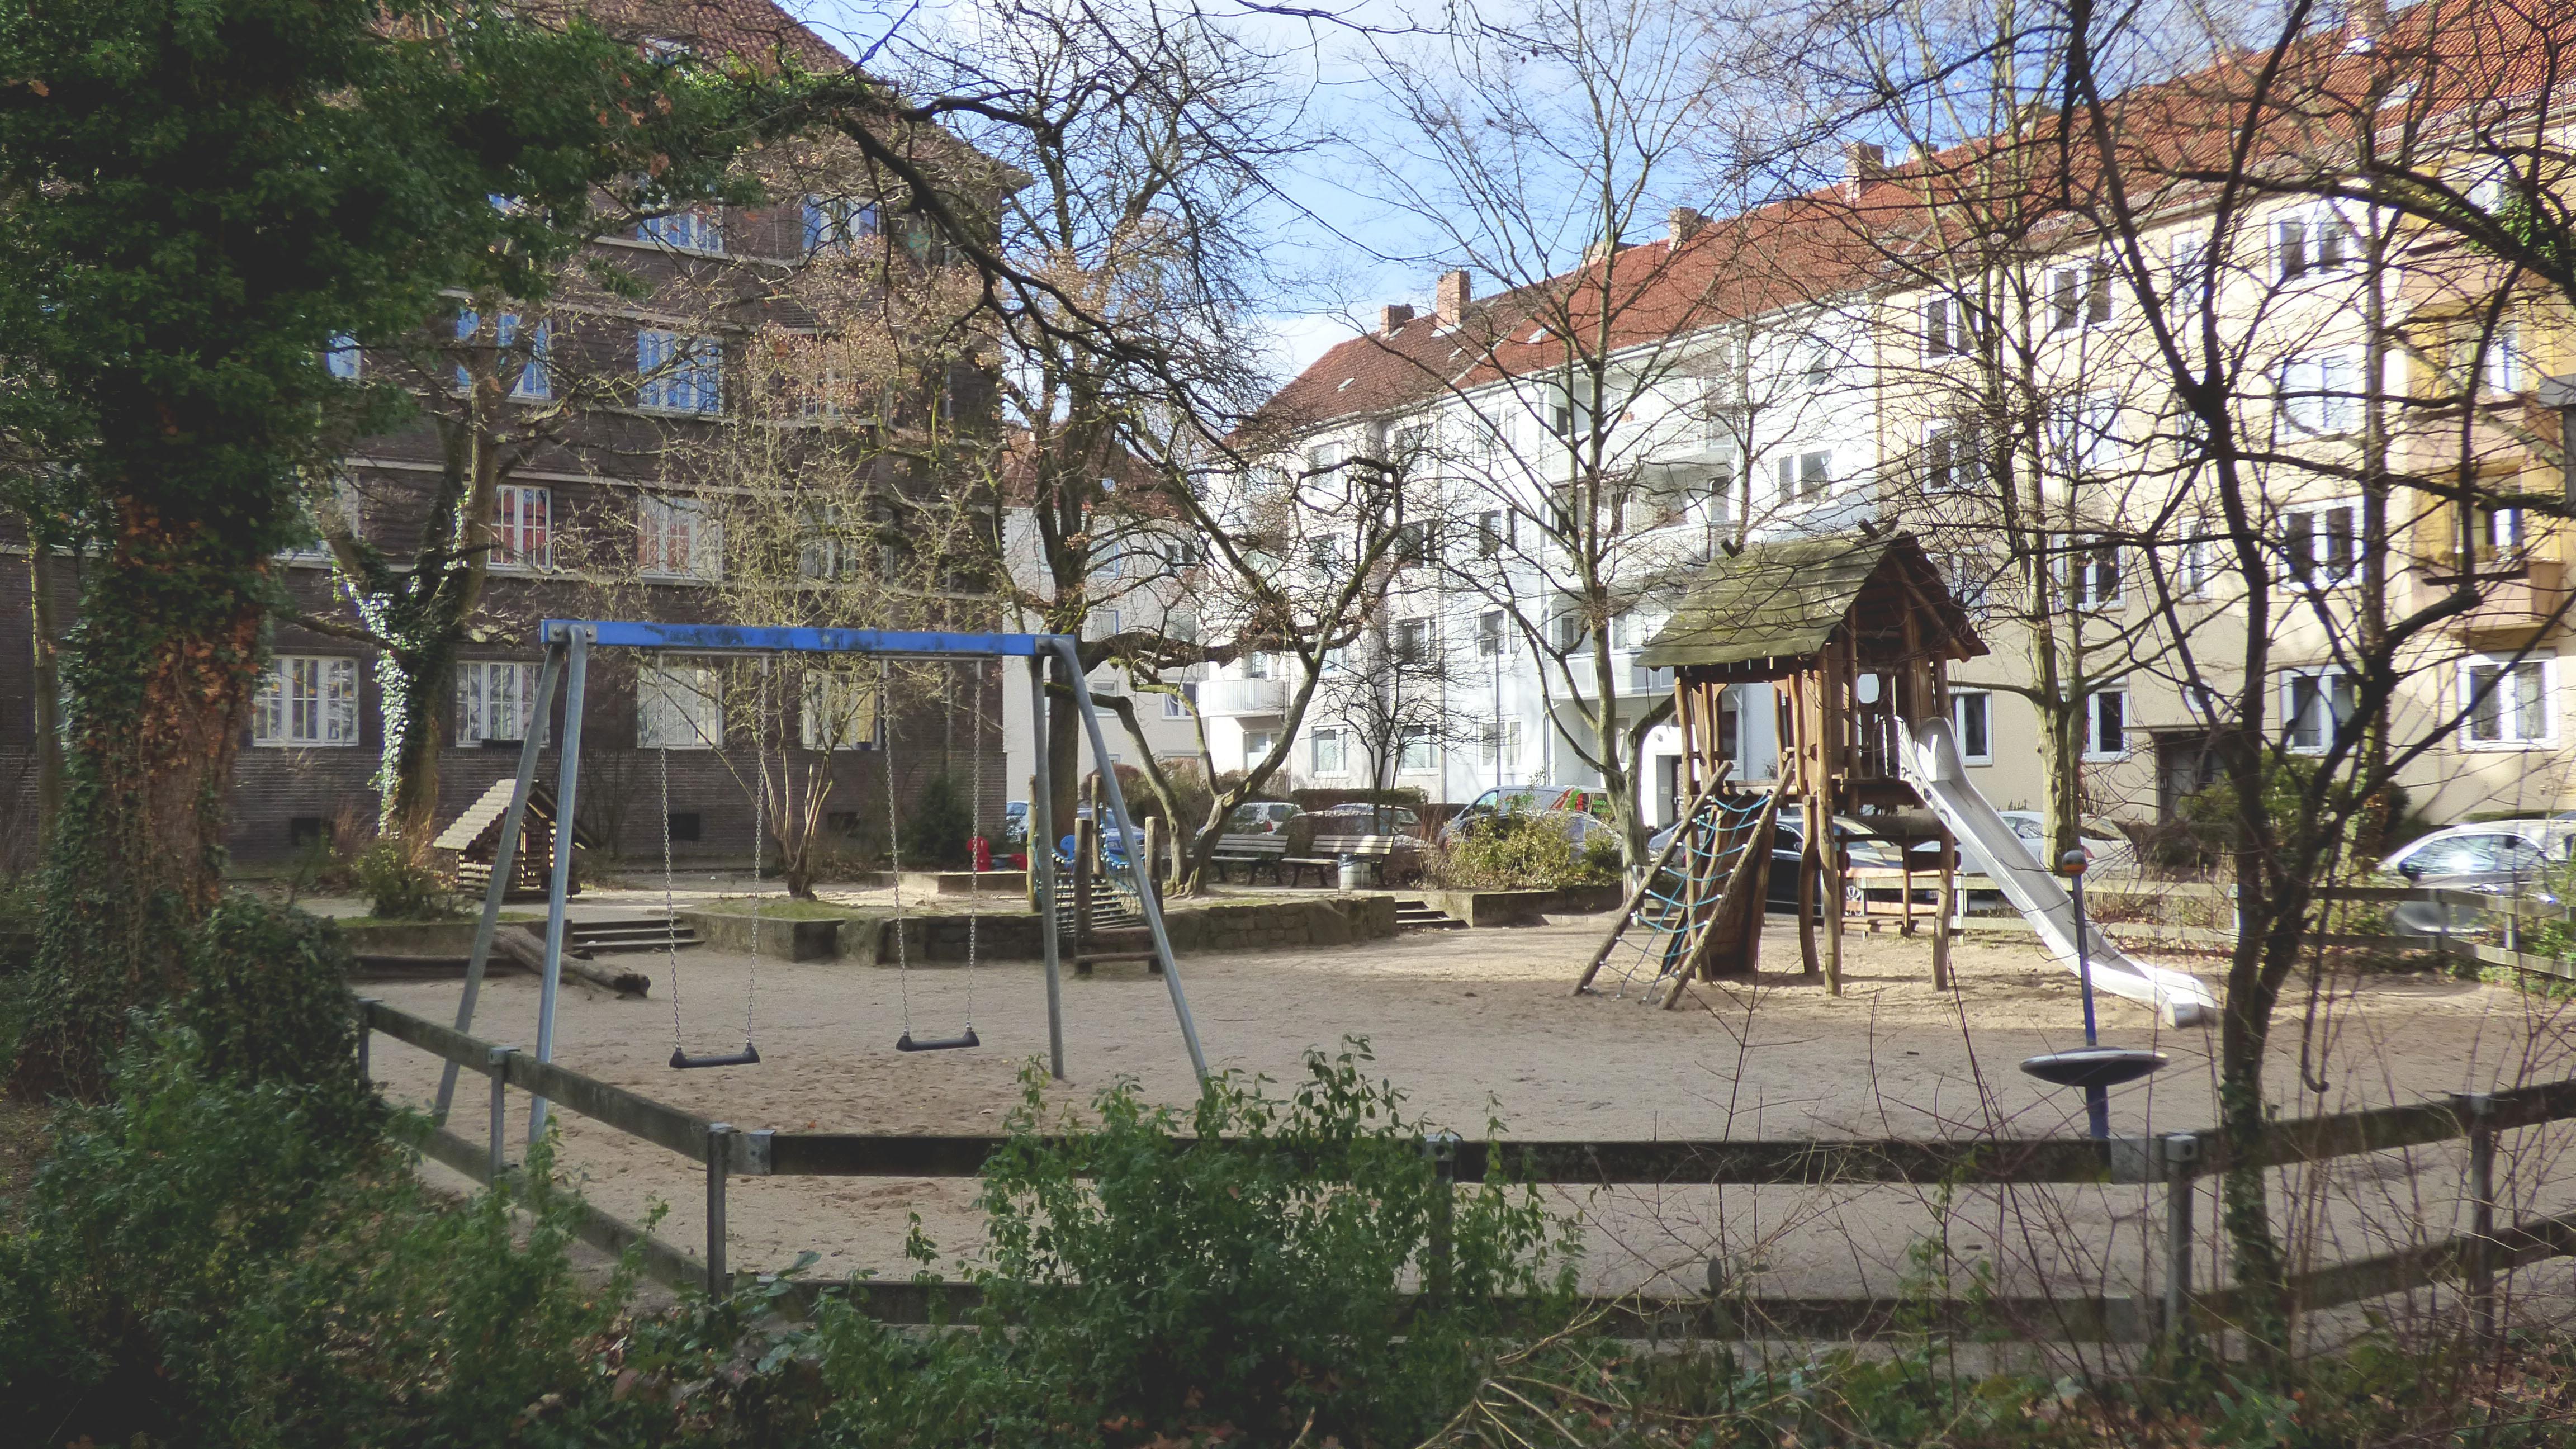 Spielplatz - Südstadt